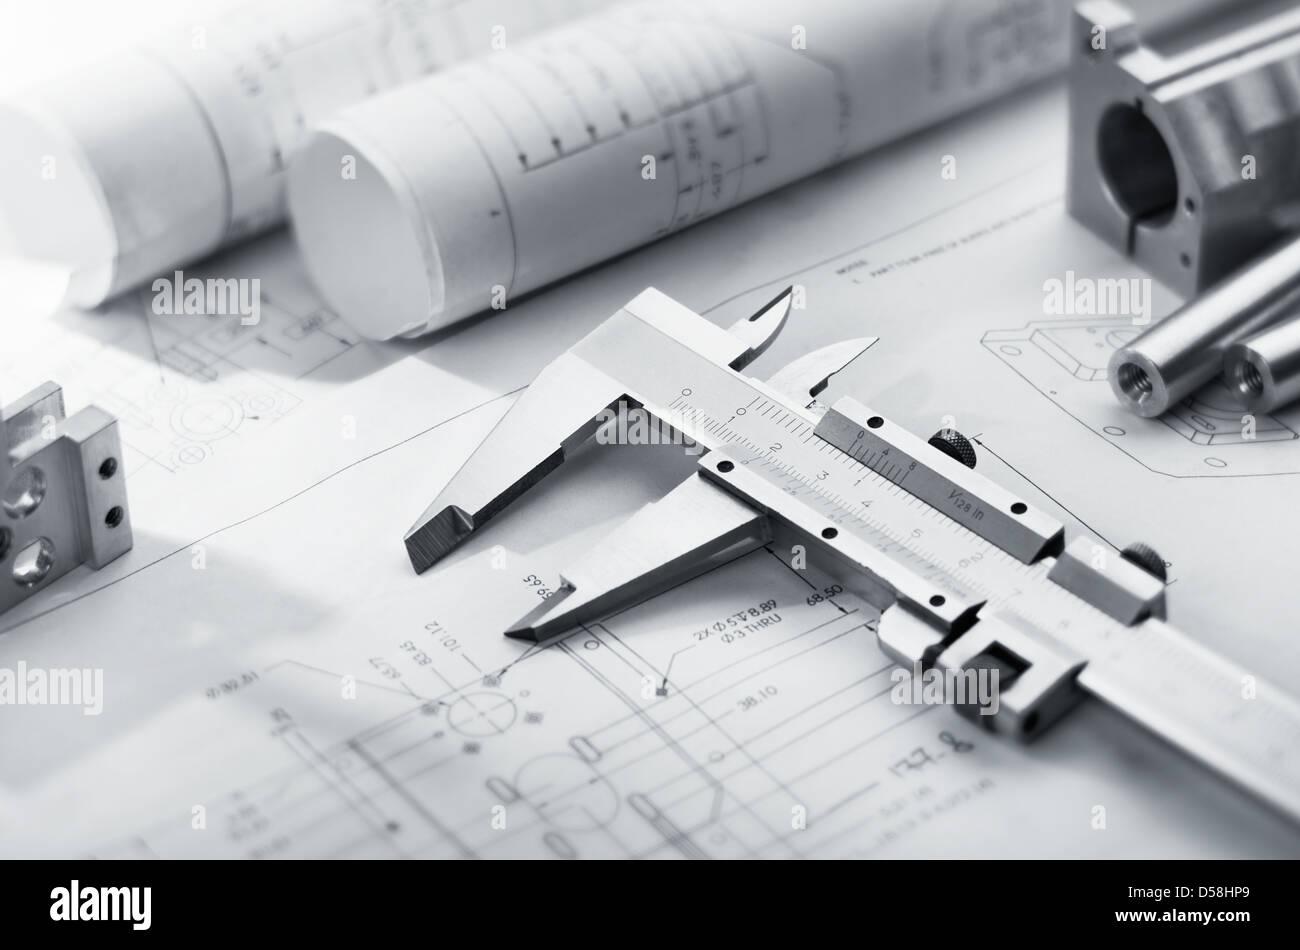 Mechanical engineering blueprint stock photos mechanical caliper and machine parts on mechanical blueprint stock image malvernweather Choice Image